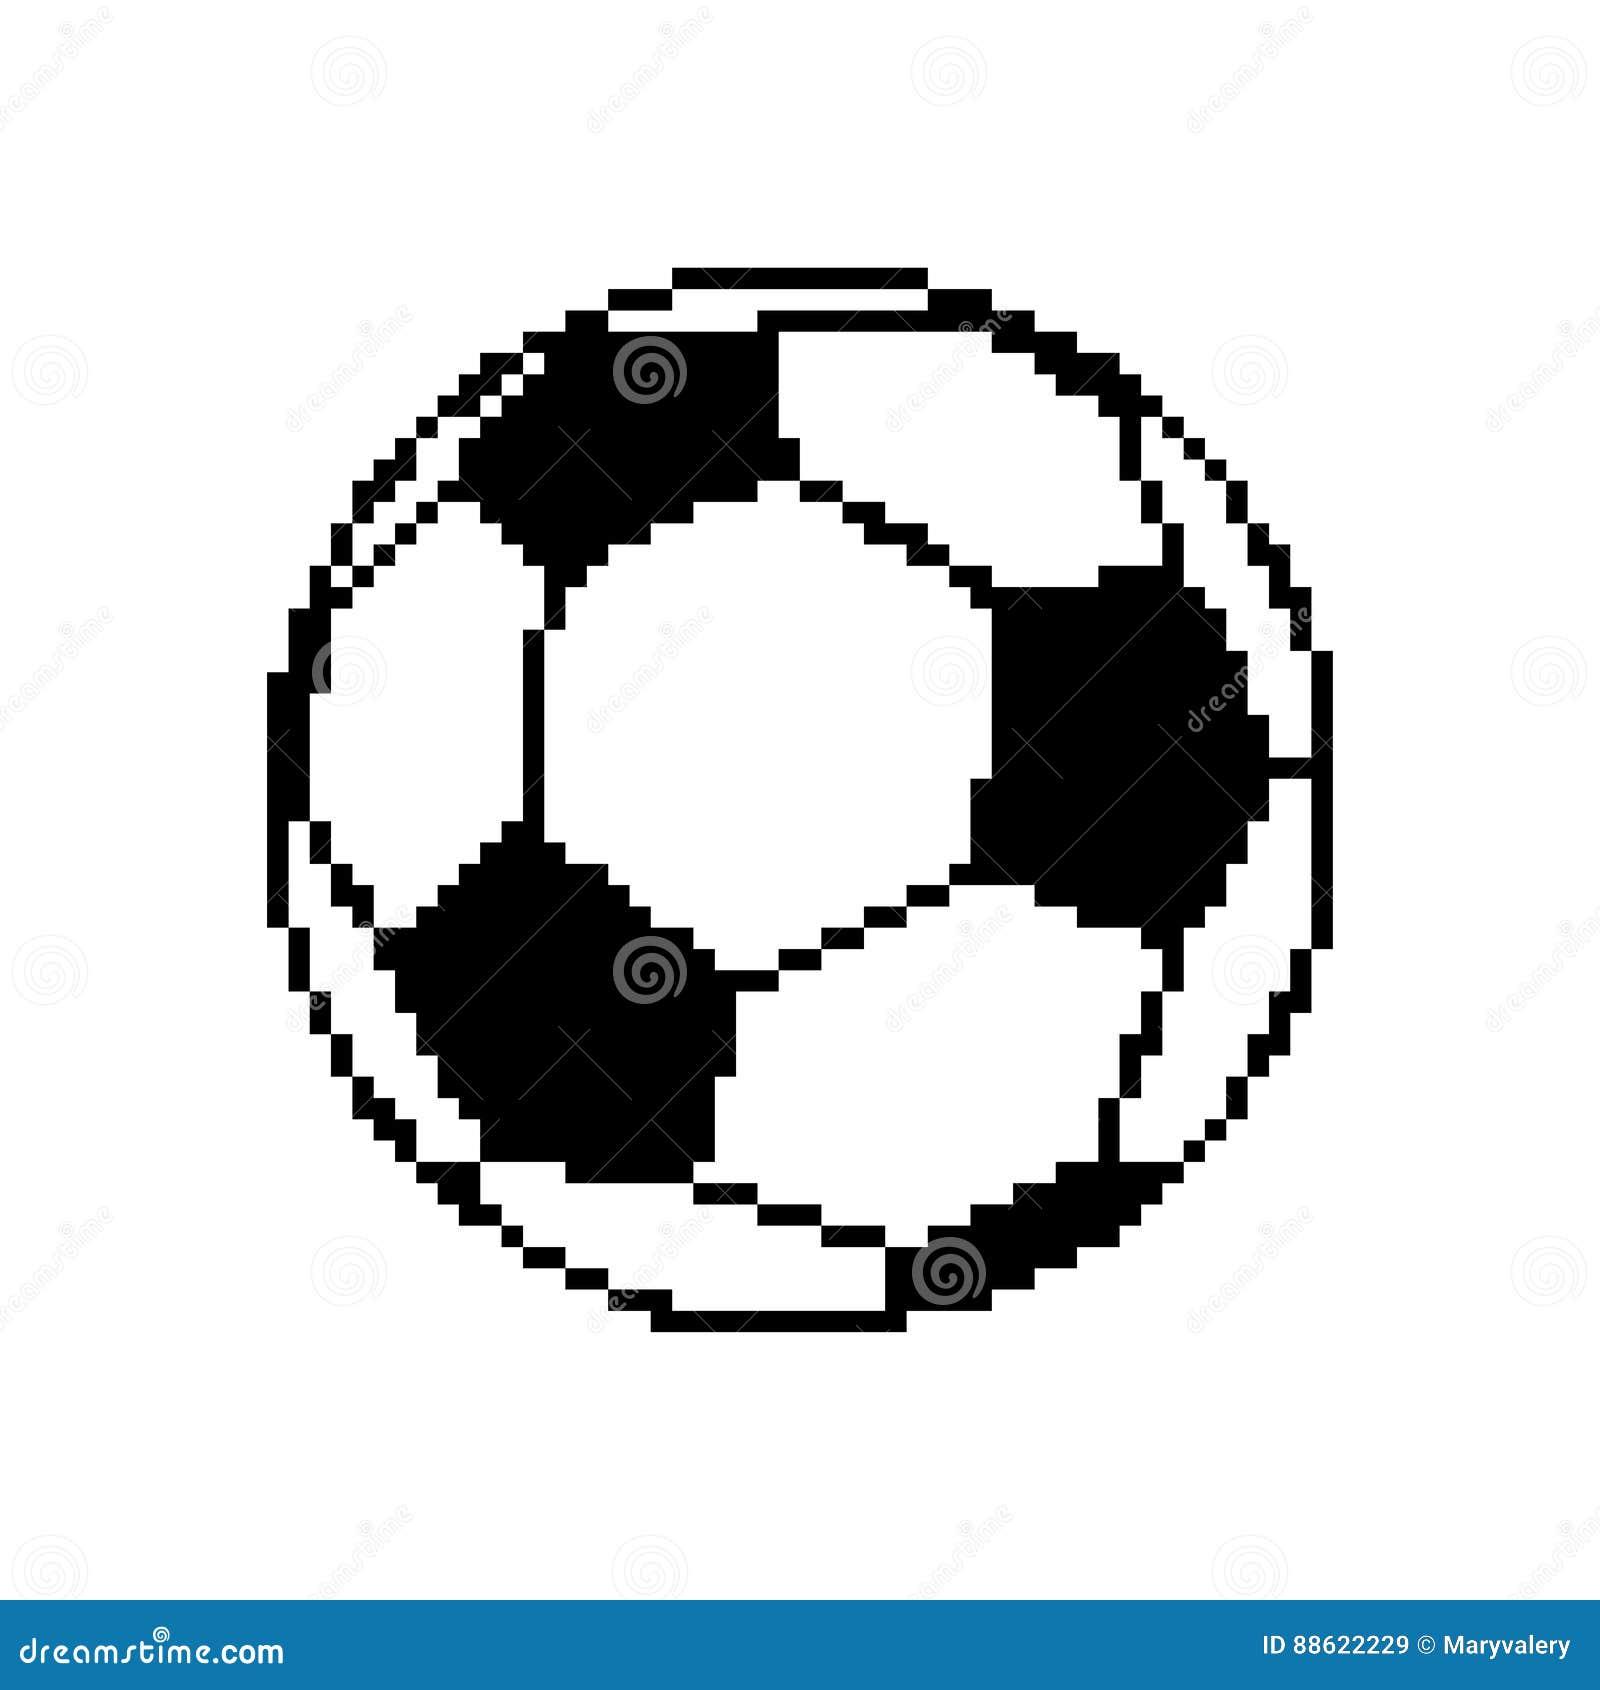 Soccer Ball Pixel Art Football Pixelated Isolated On White